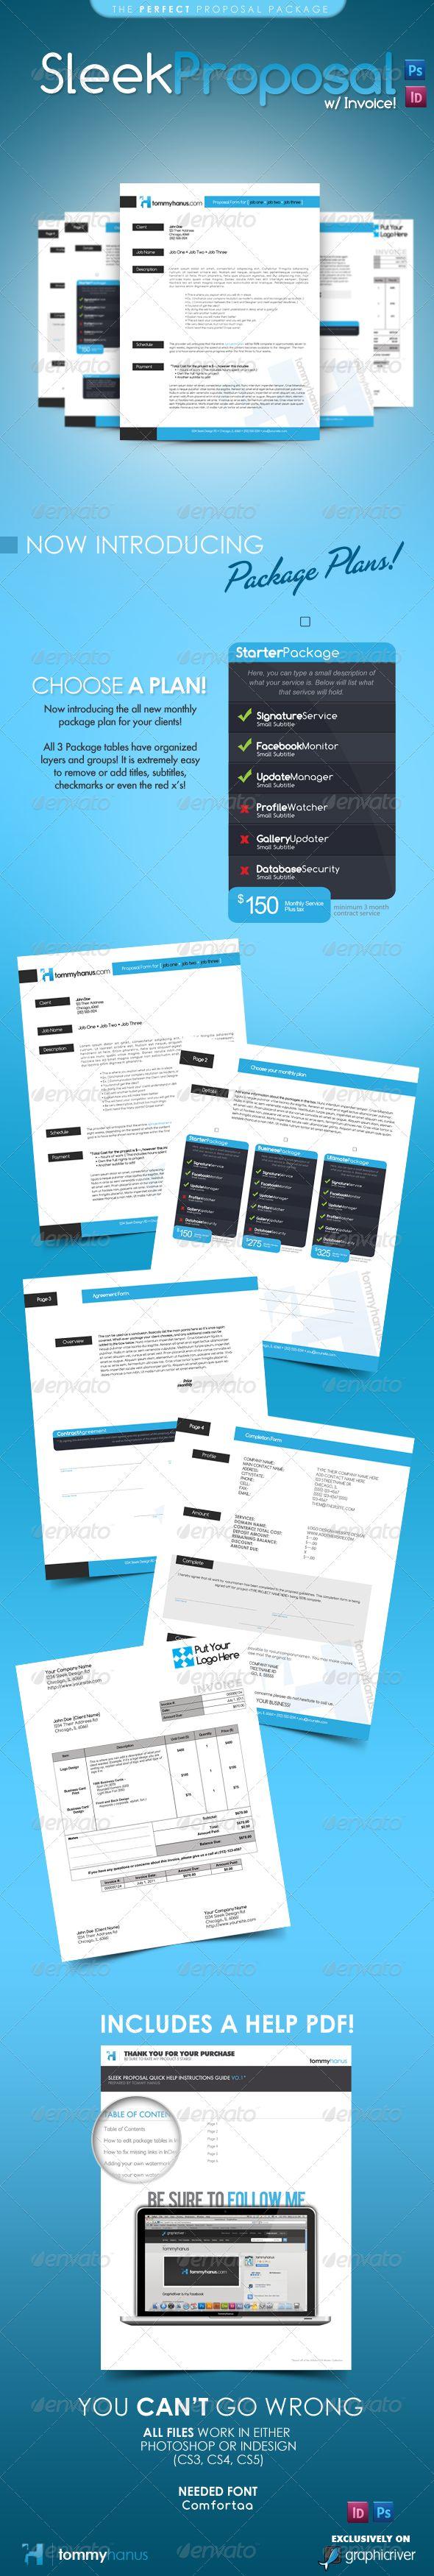 Sleek Proposal Template PSD, InDesign INDD. Download here: http://graphicriver.net/item/sleek-proposal-professional-proposal-template/308637?s_rank=1216&ref=yinkira